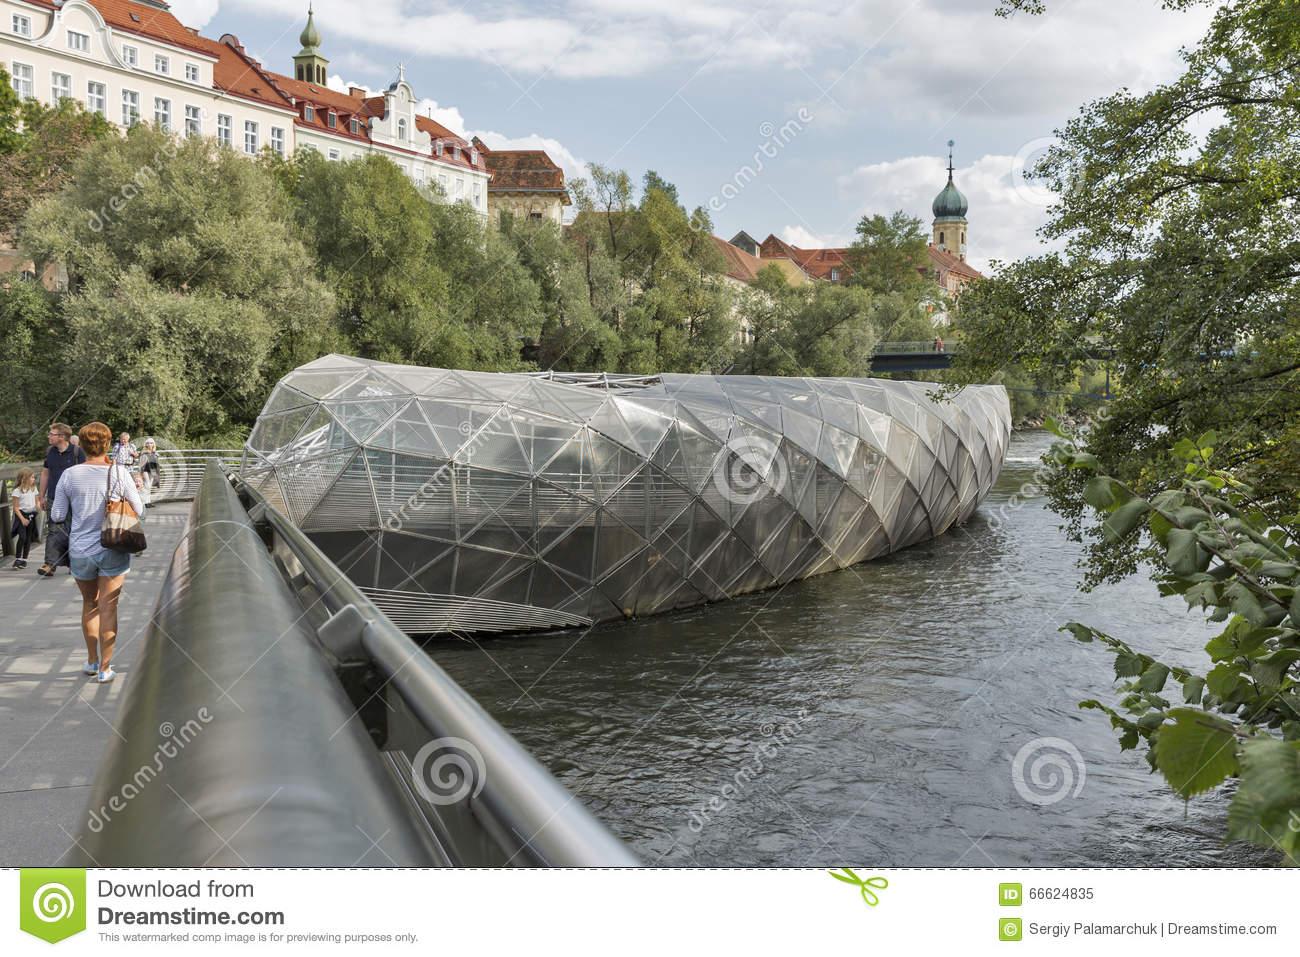 Murinsel Artificial Island On The Mur River In Graz, Austria.